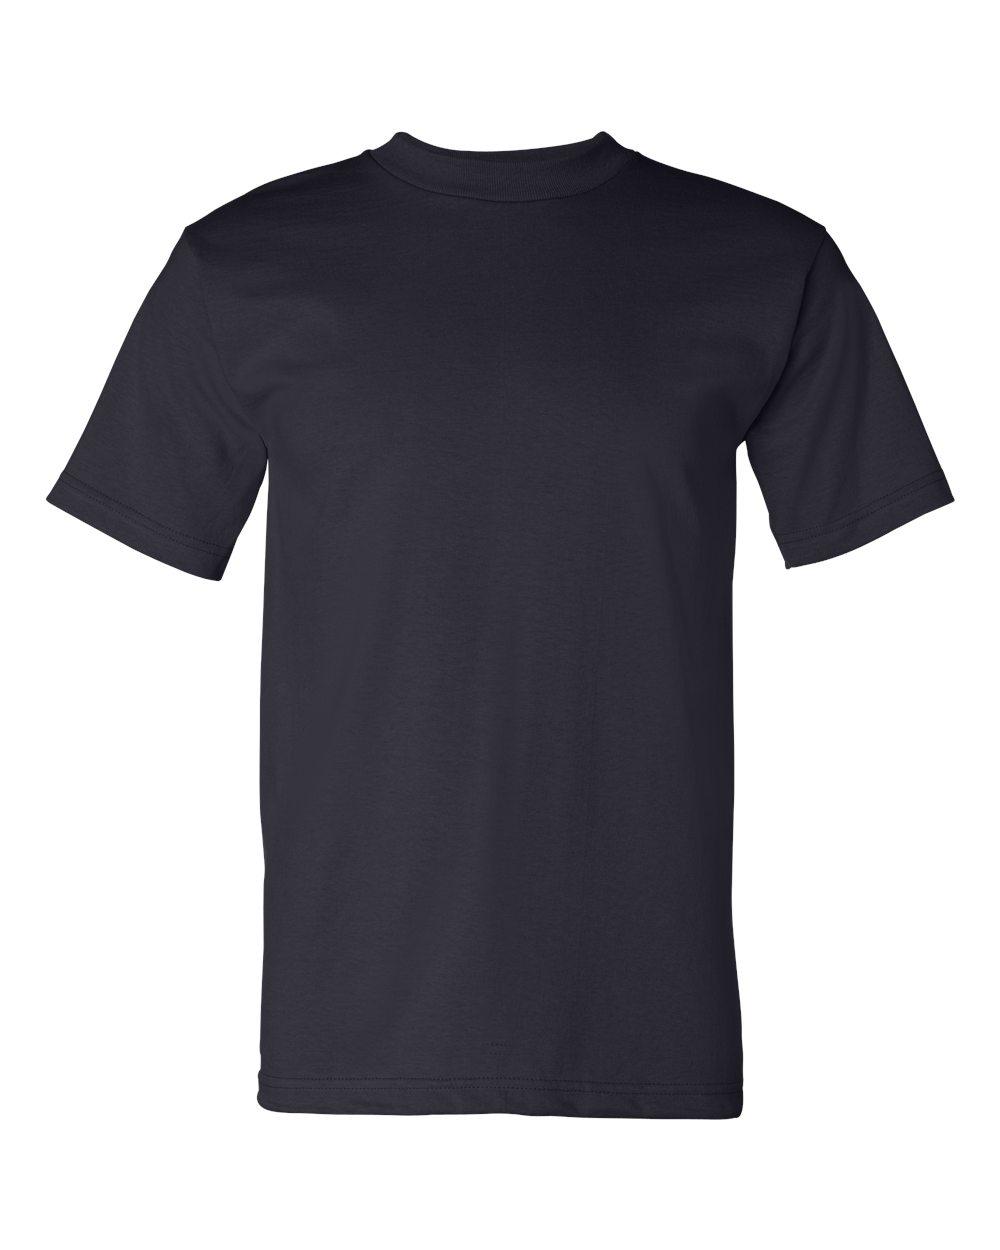 Bayside-Mens-Cotton-Blank-USA-Made-Short-Sleeve-T-Shirt-5100-up-to-5XL thumbnail 27